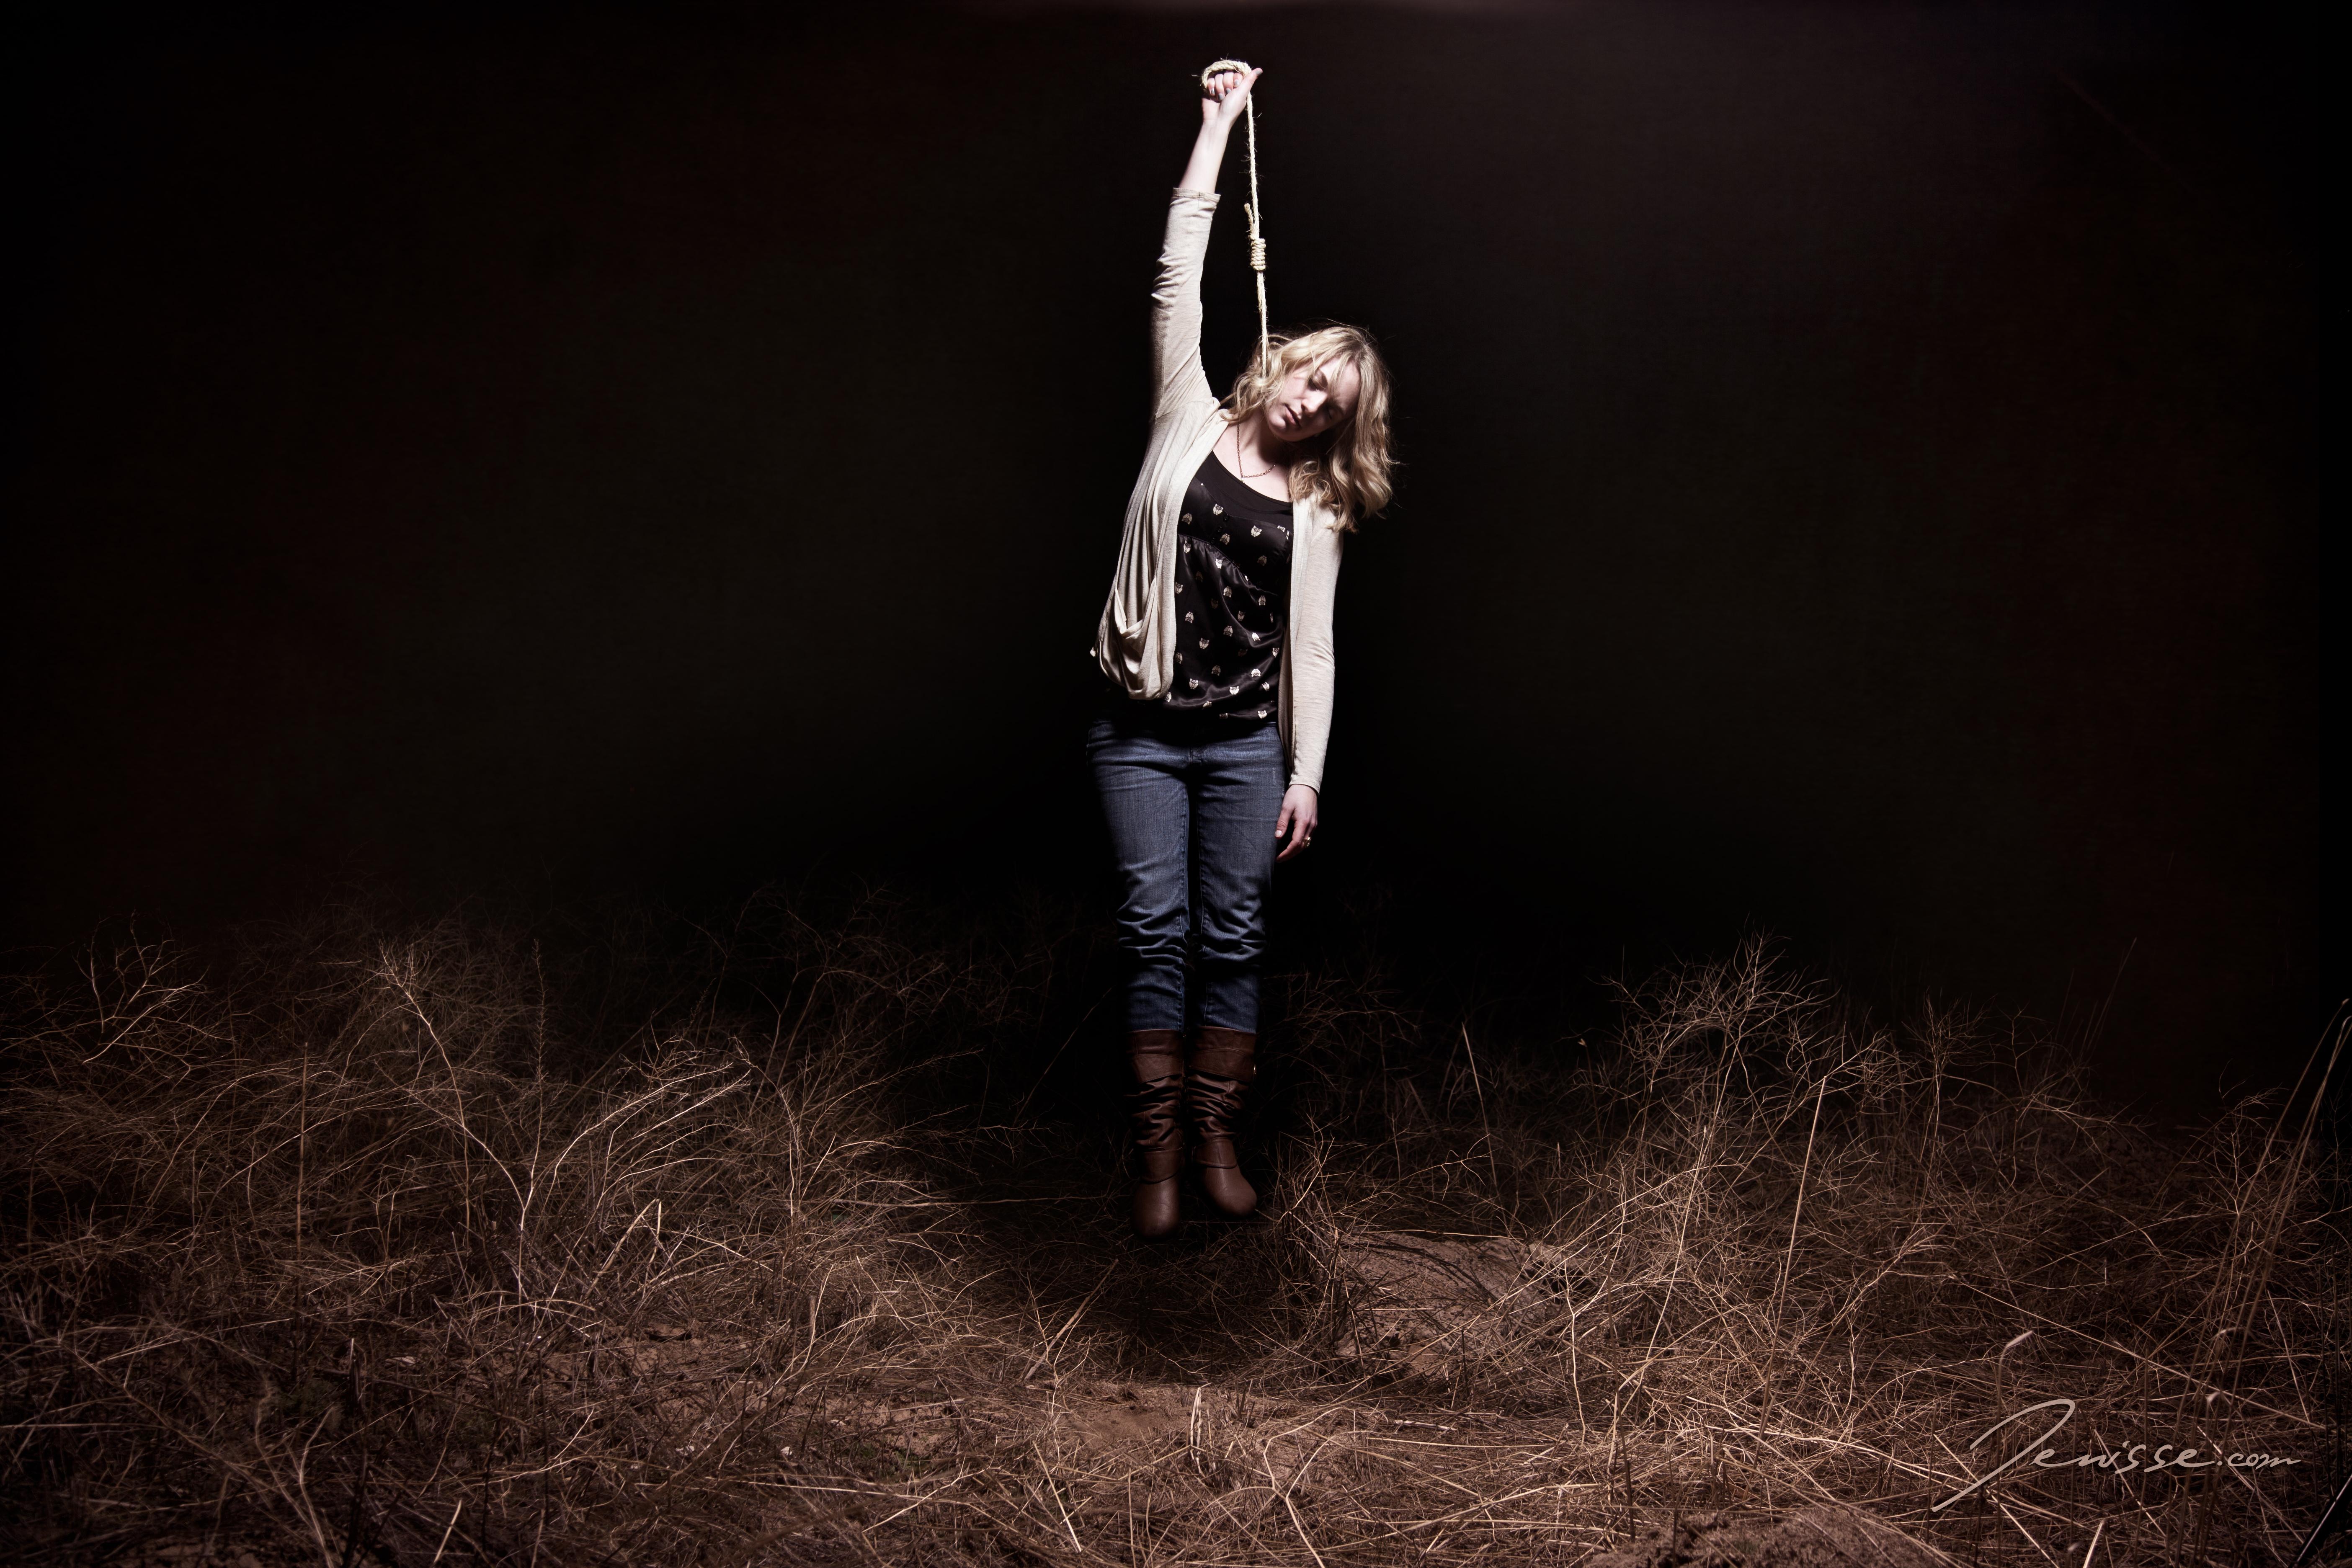 Wallpaper : woman, silly, cute, girl, field, lady, night, Photoshop, dark, dead, death, Utah, jump, funny, boots, grim, magic, hangman, suicide, evil, ...